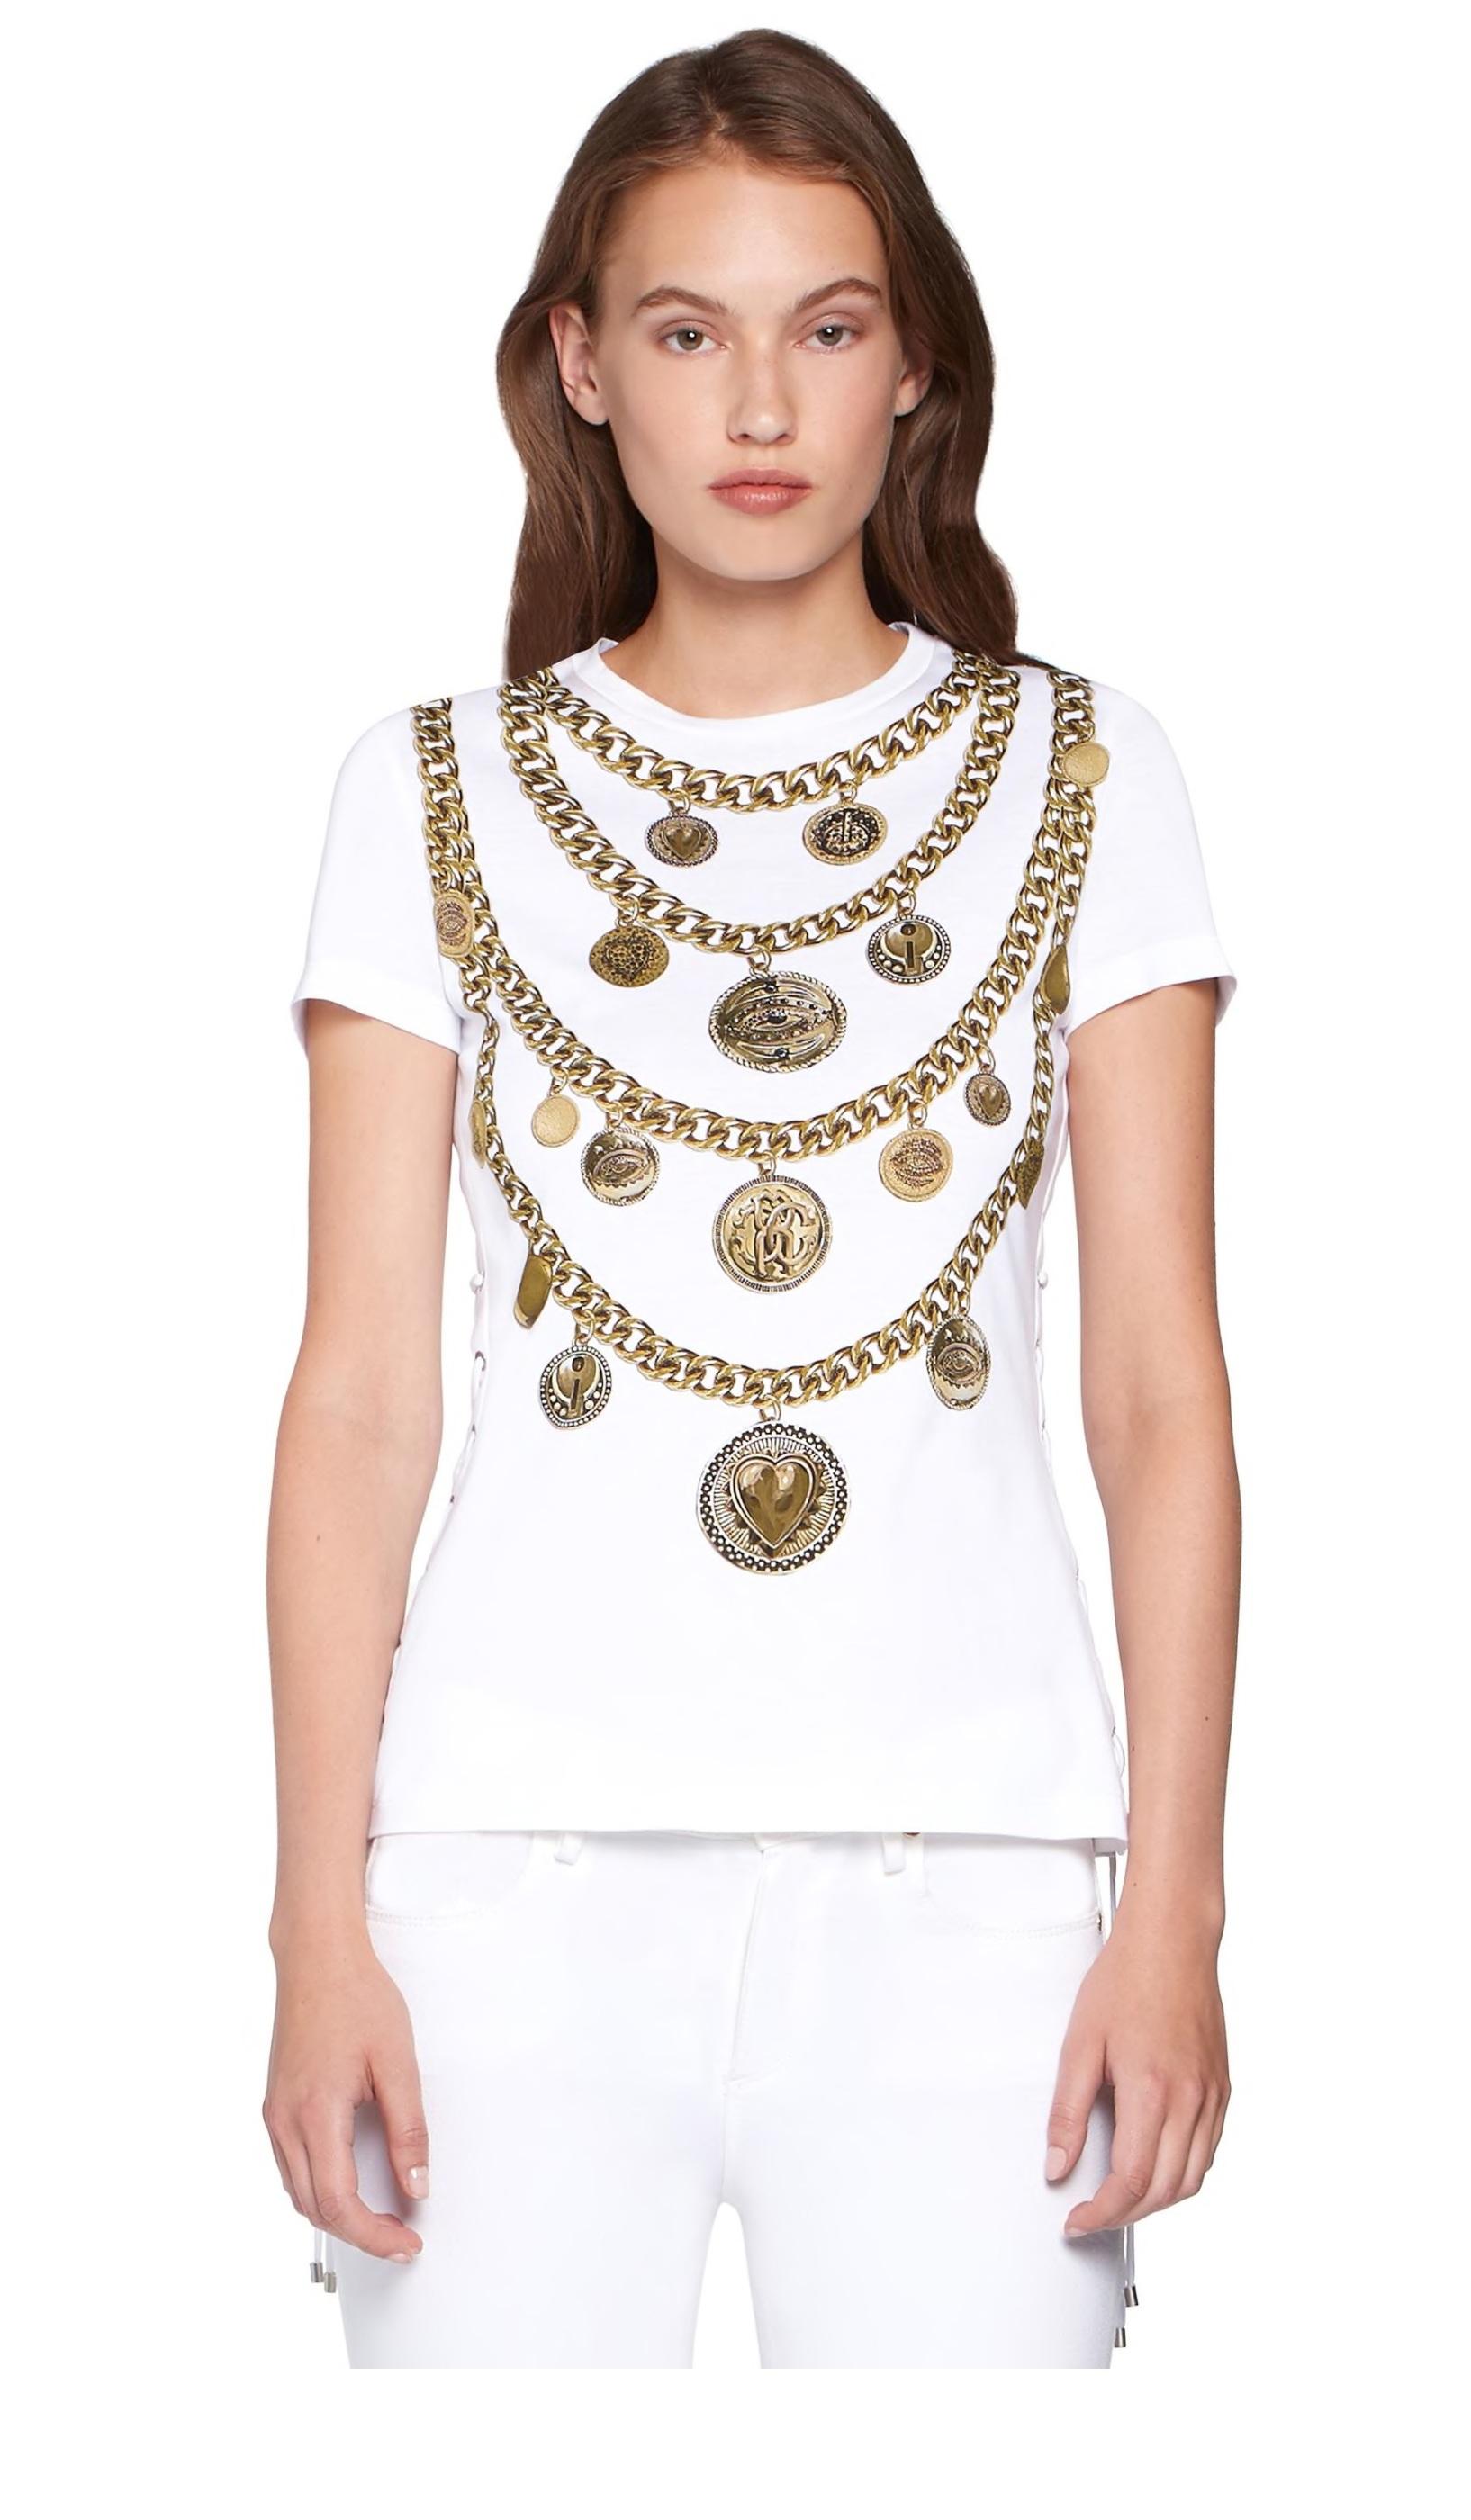 roberto-cavalli-medallion-print-t-shirt_13150805_15612854_2048.jpg